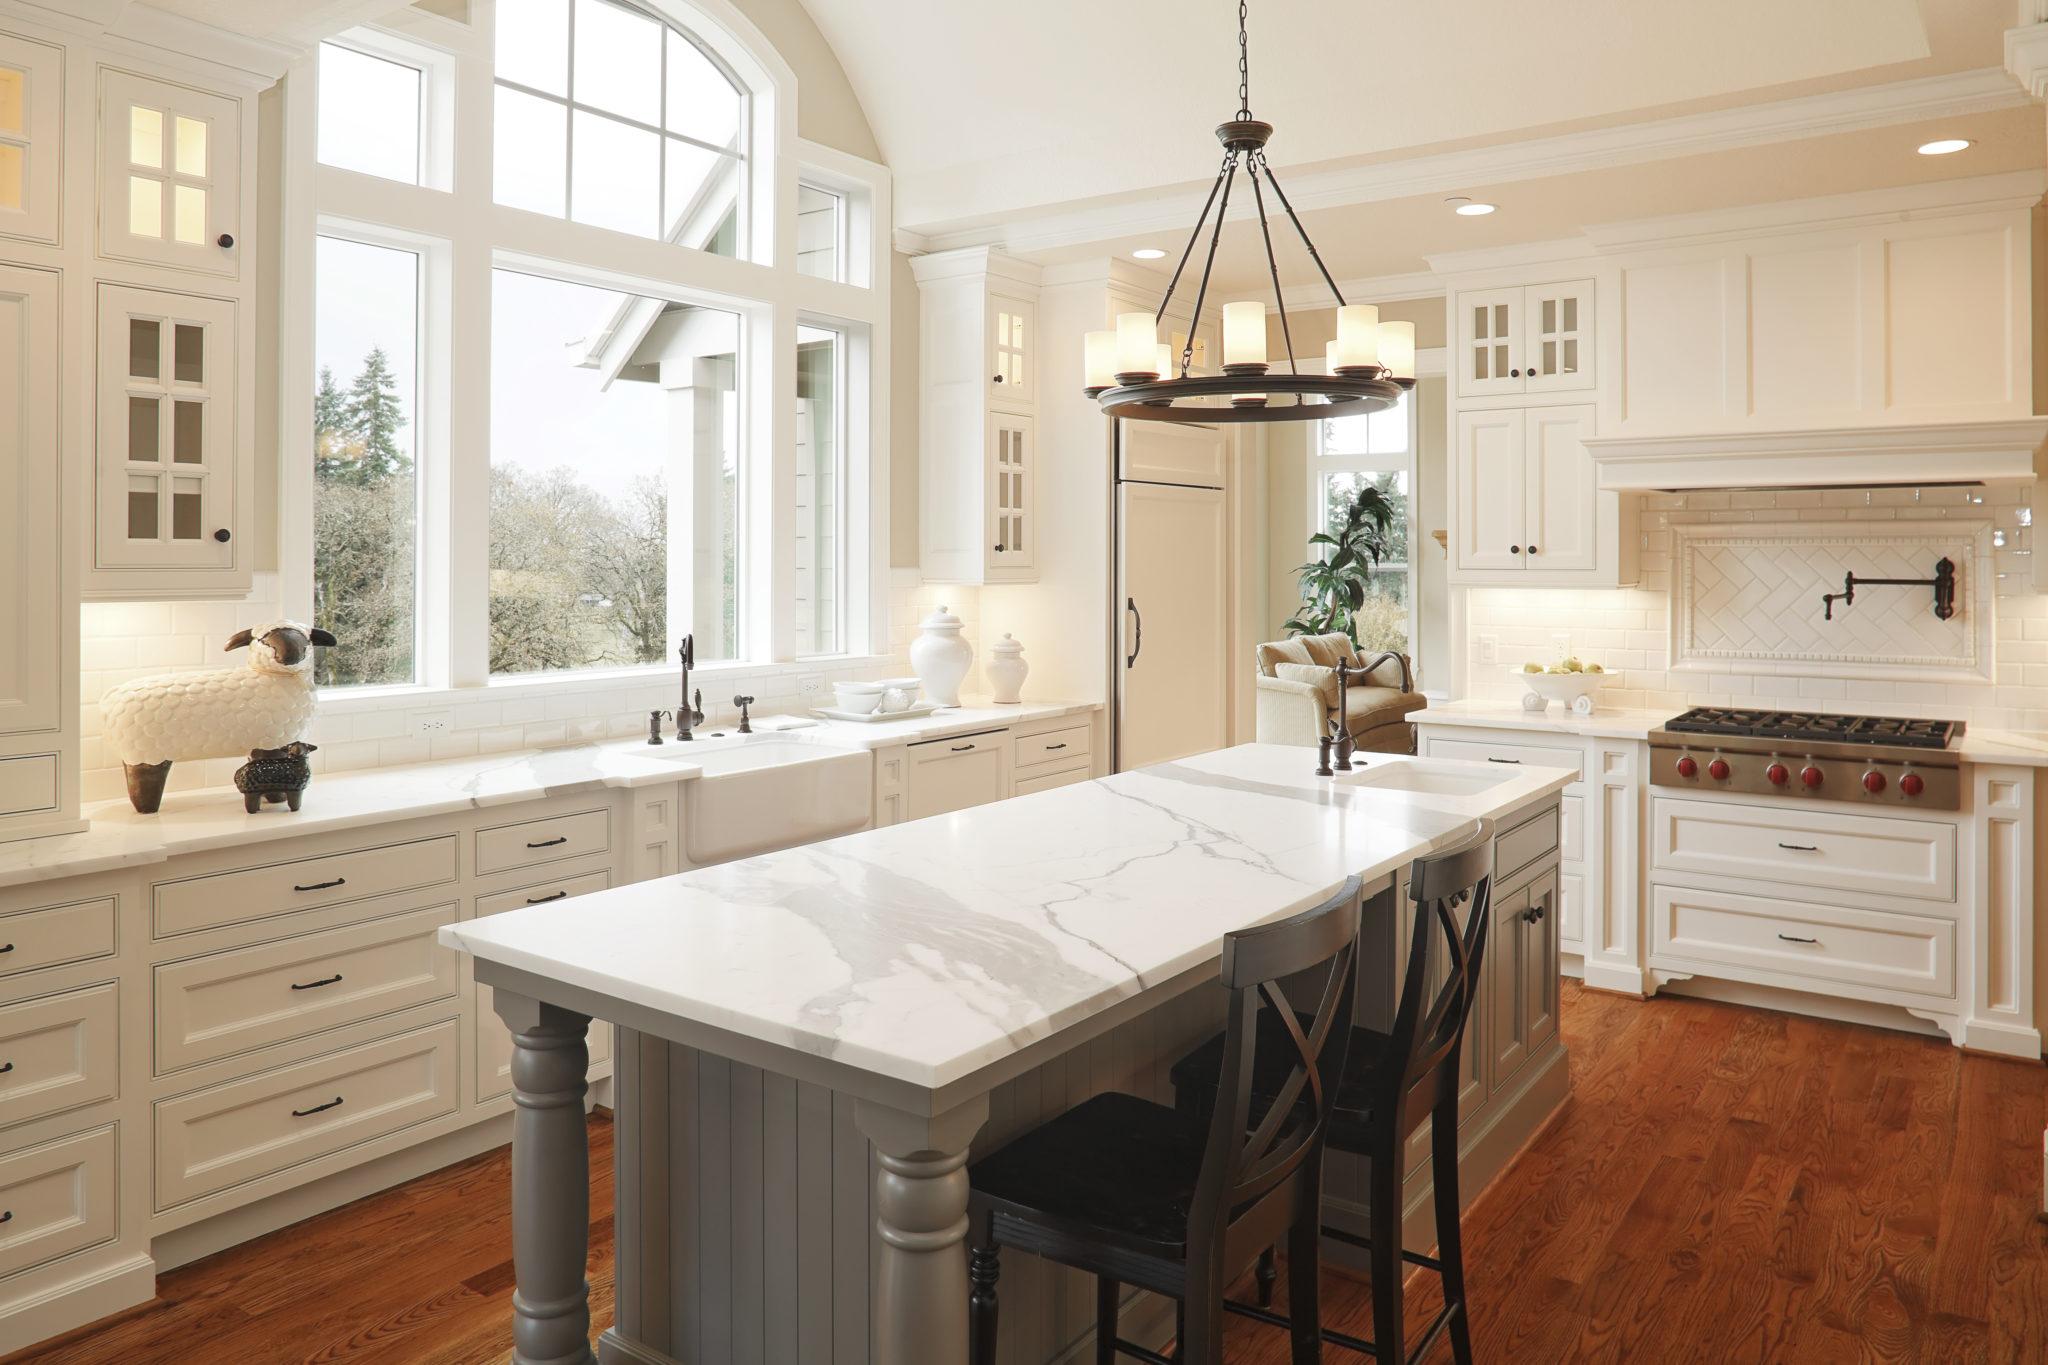 Tampa custom kitchen design